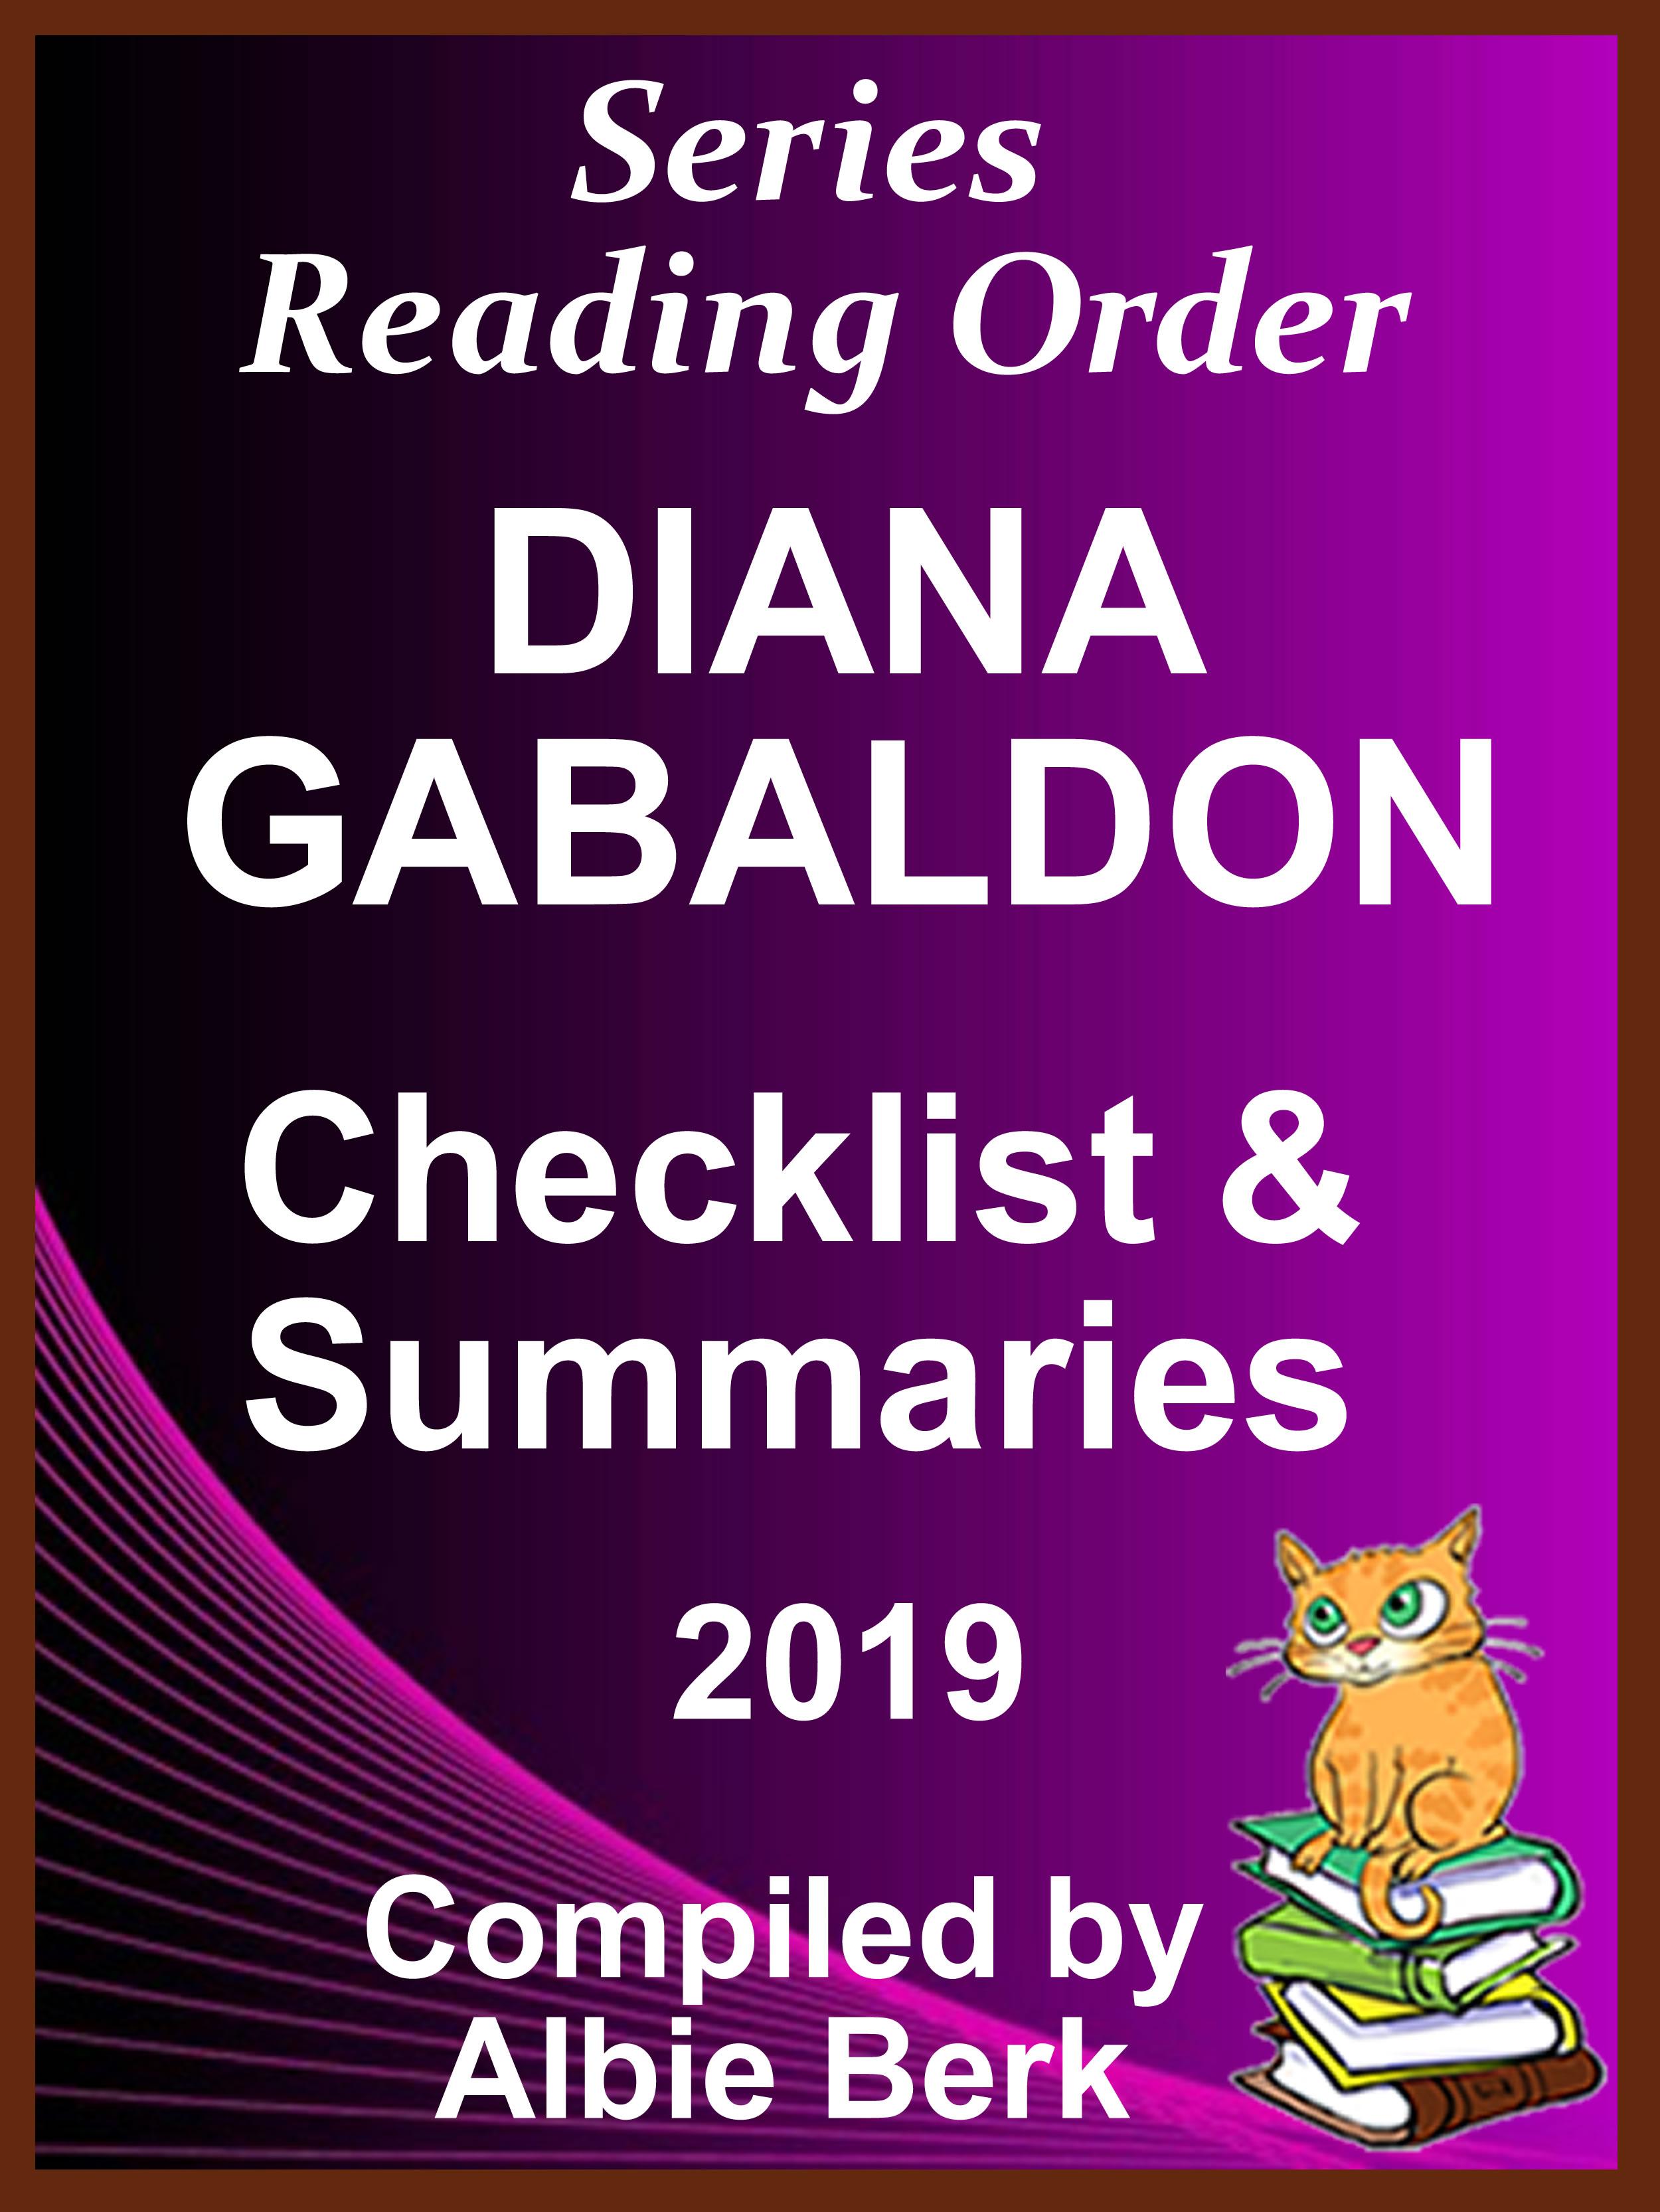 Diana Gabaldon's Best Reading Order - with Summaries & Checklist, an Ebook  by Albie Berk